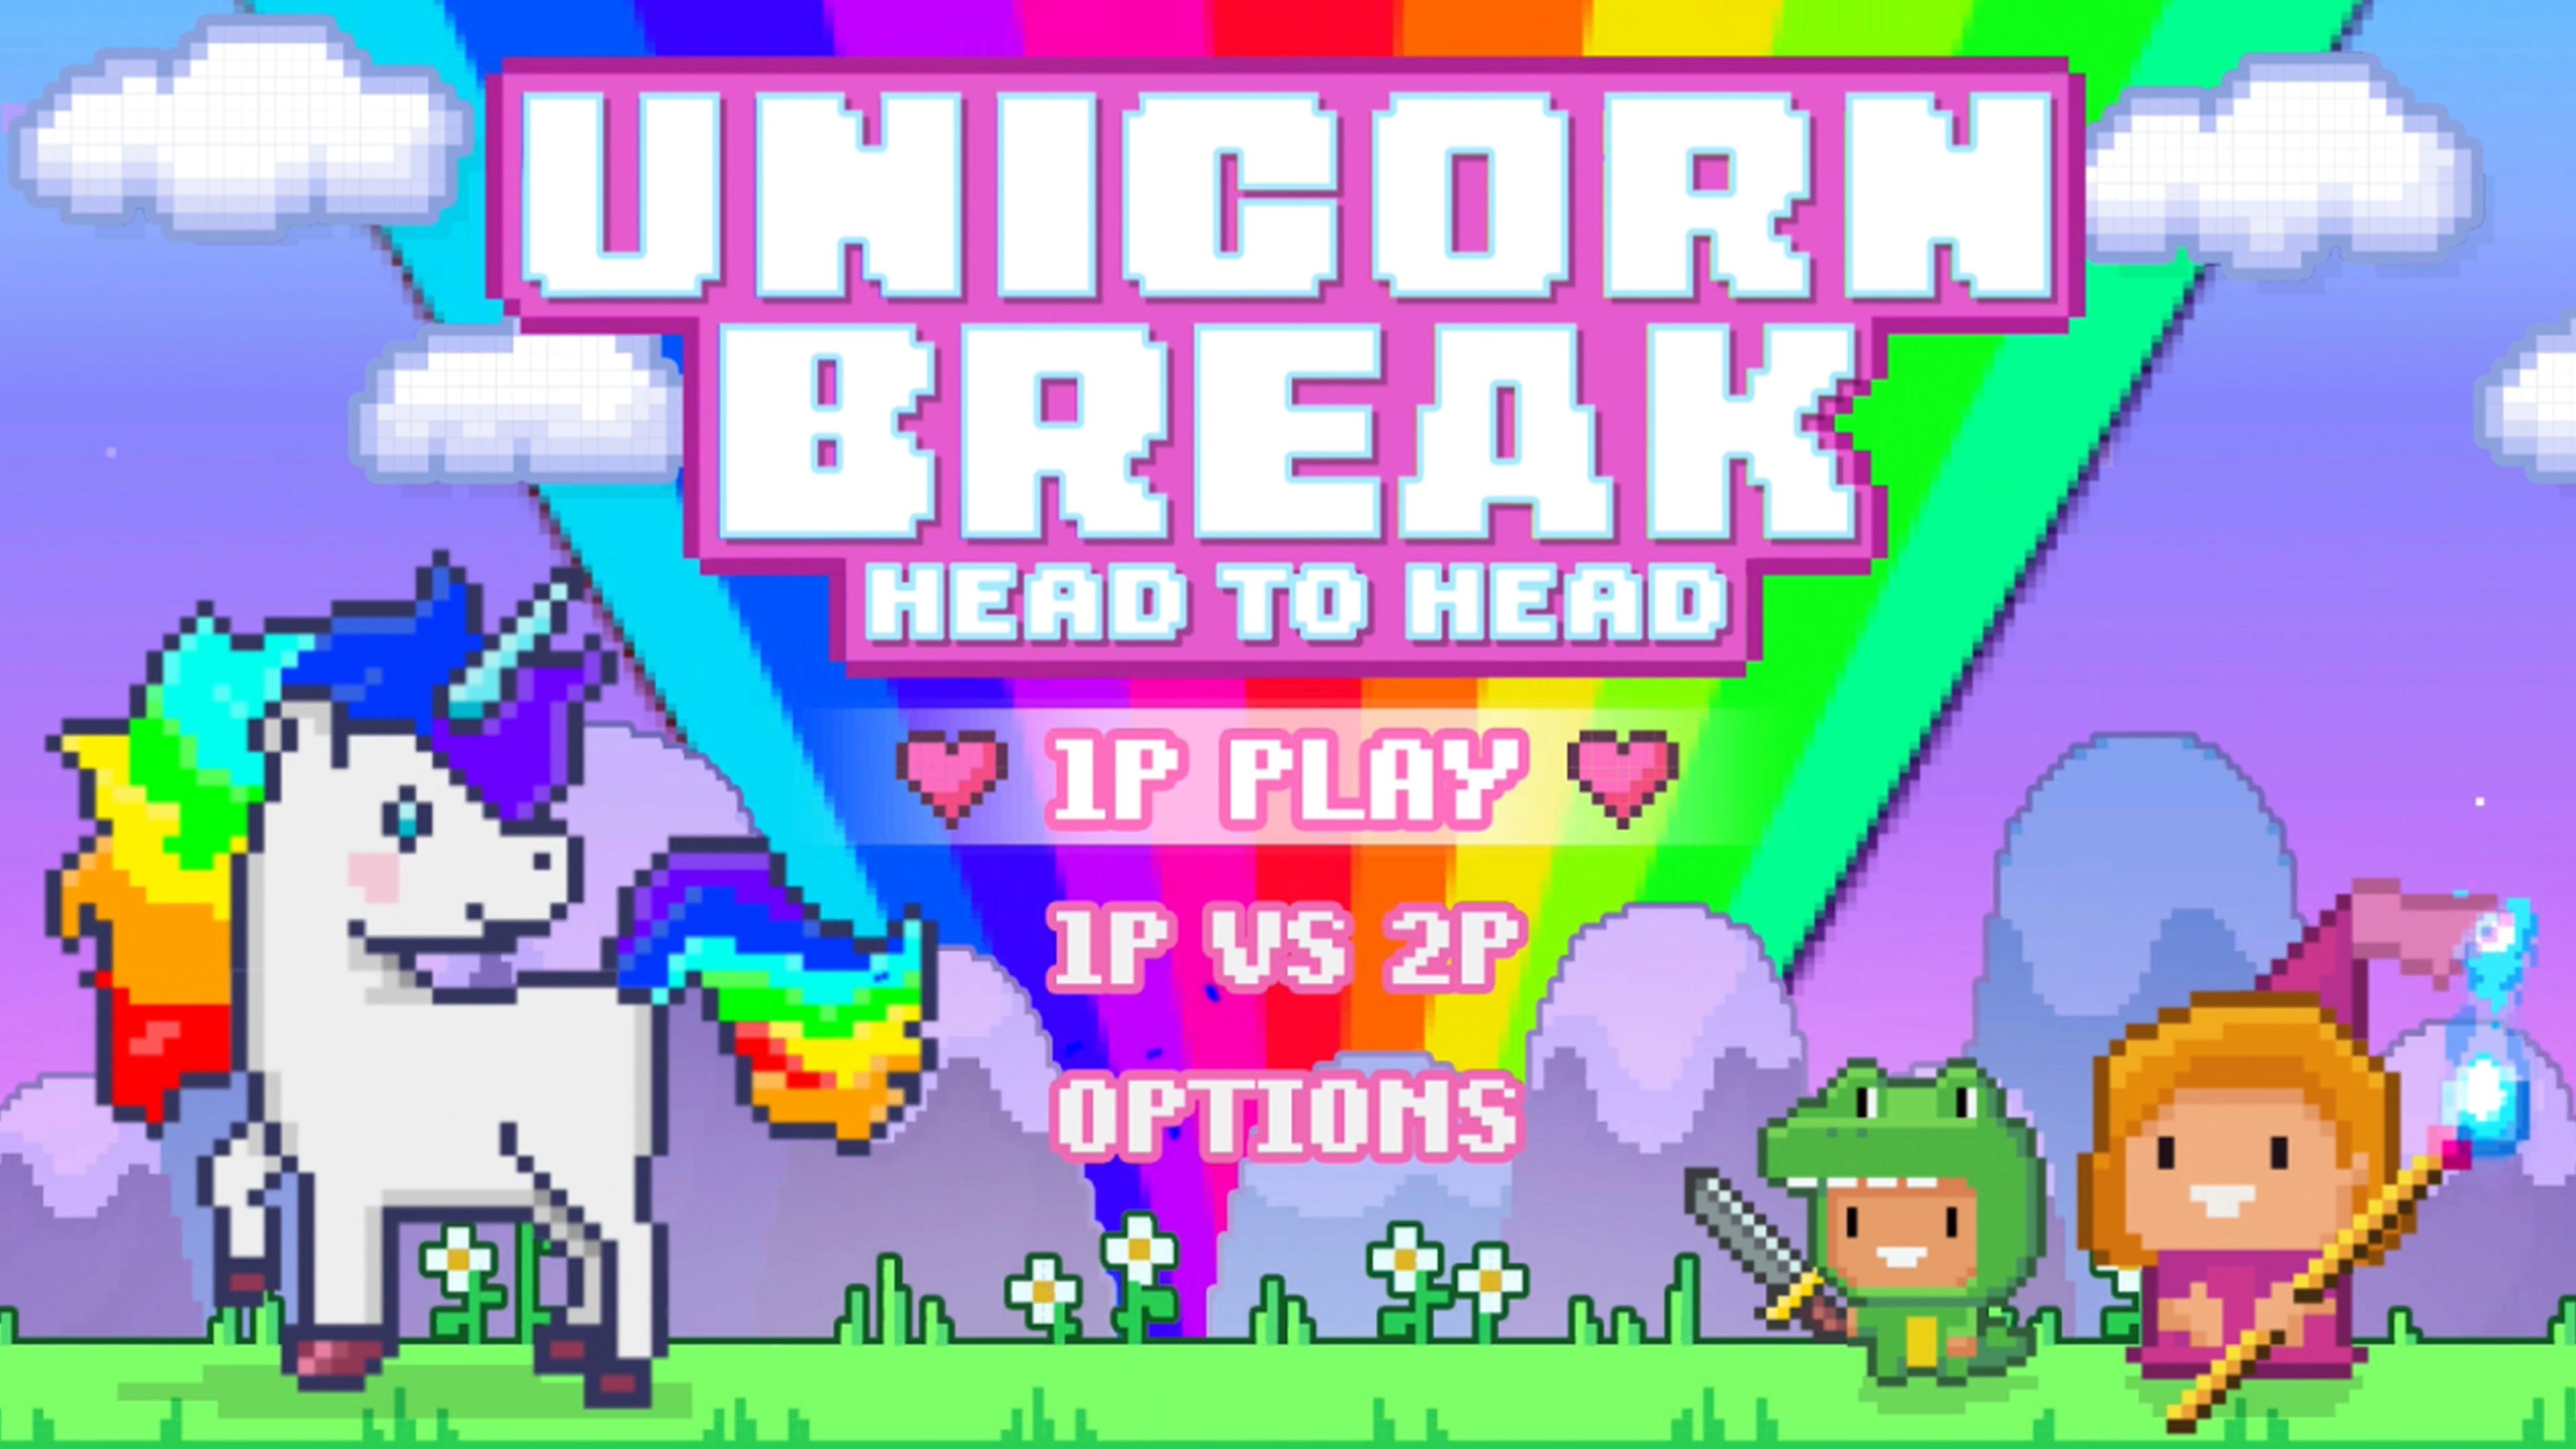 Скриншот №1 к Unicorn Break Head to Head - Avatar Full Game Bundle